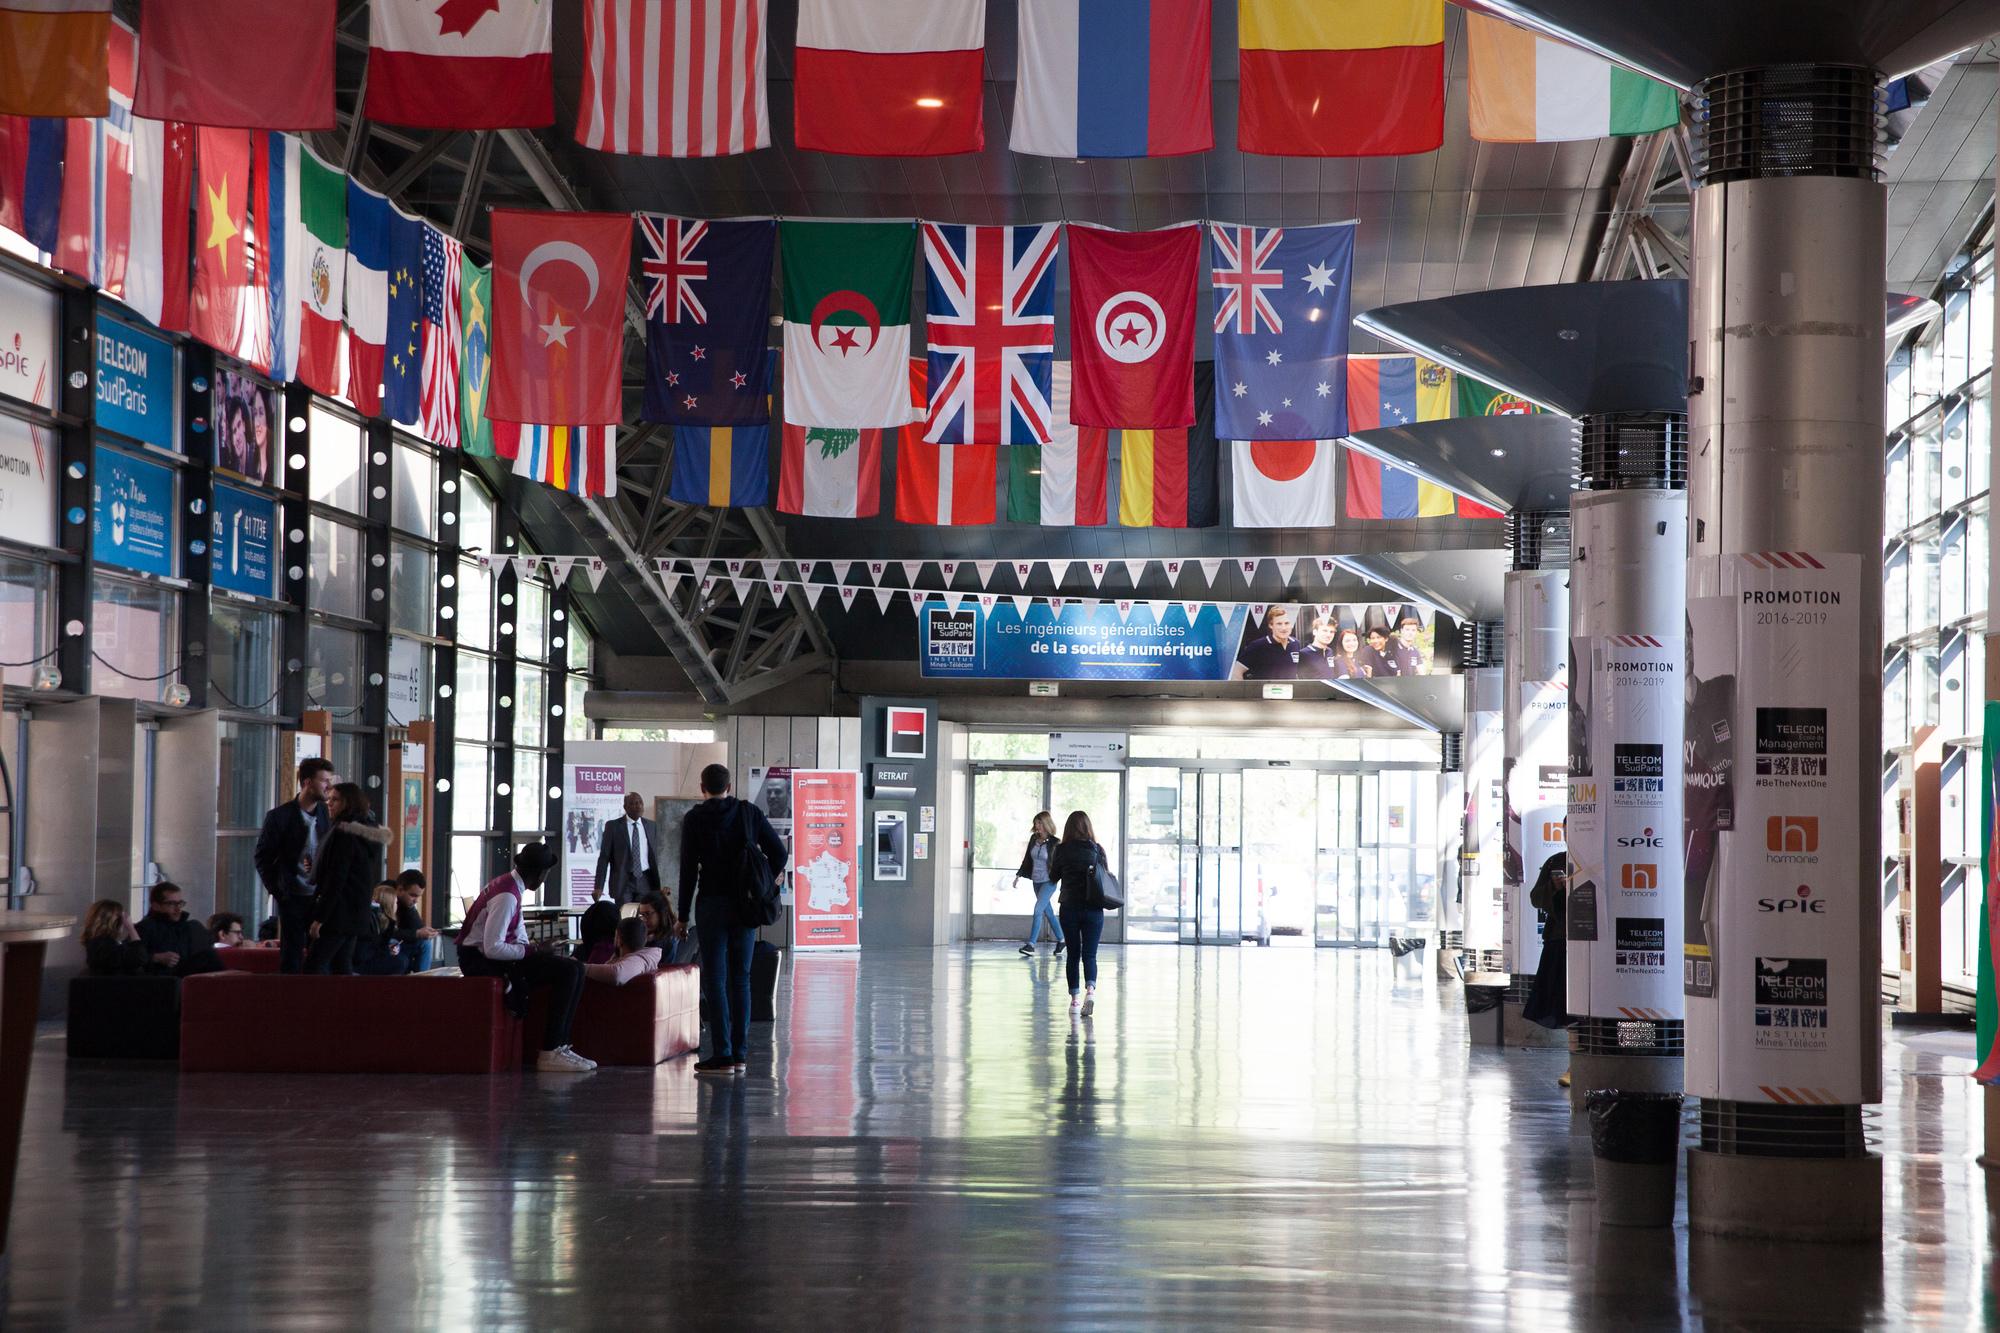 Study abroad and Exchange program